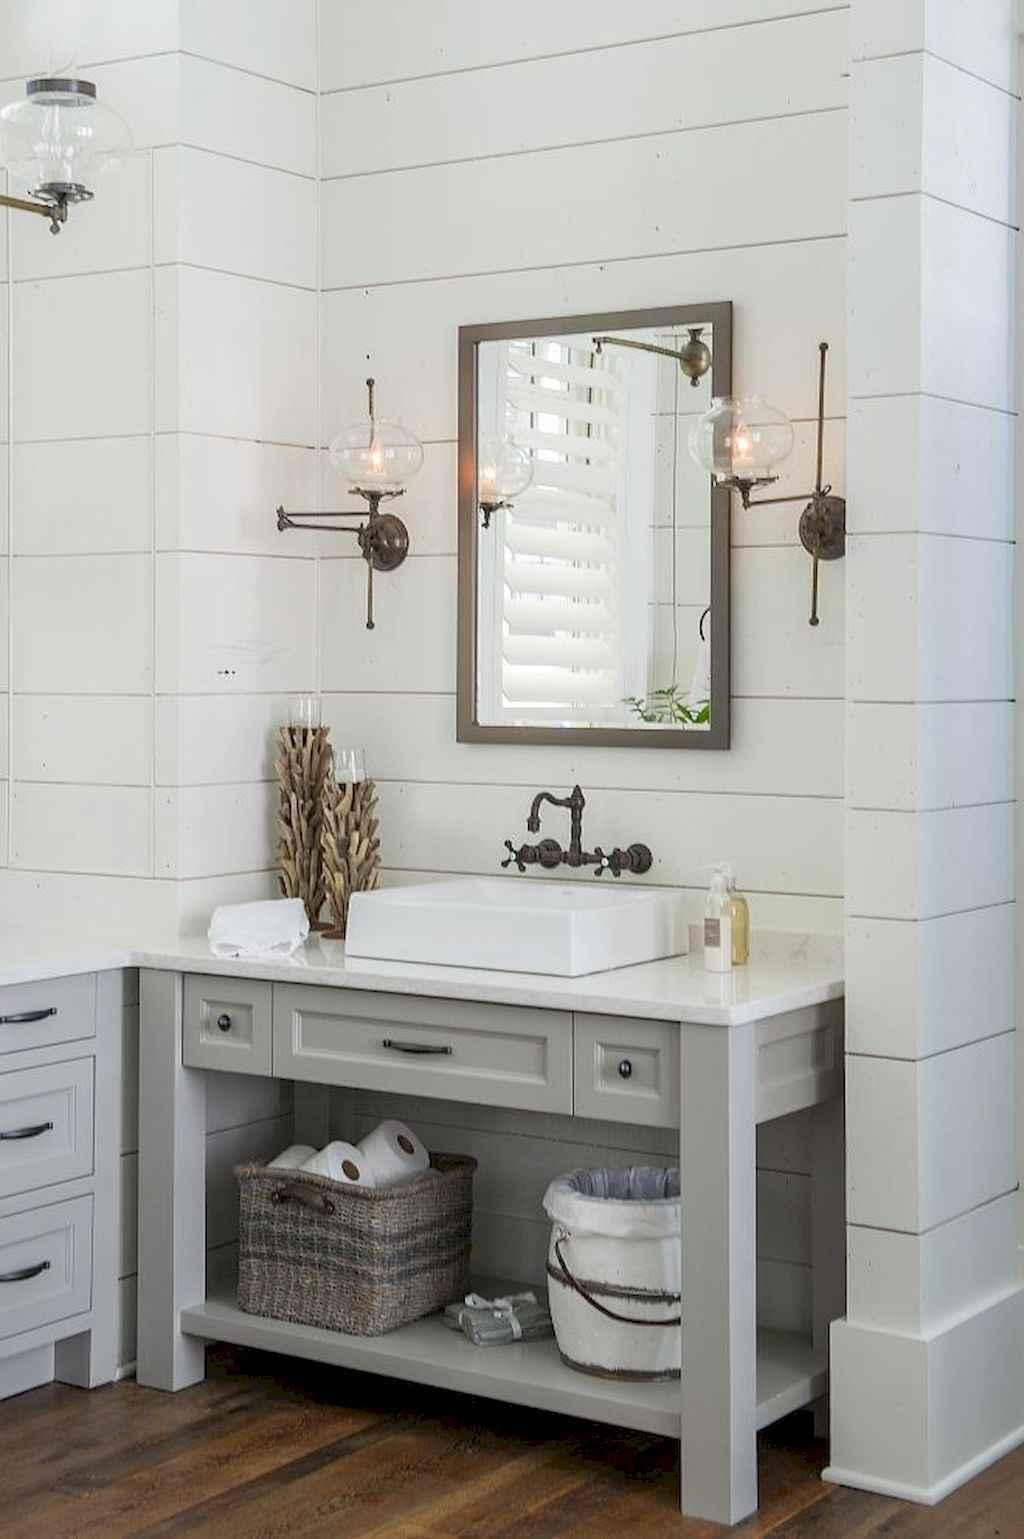 125 awesome farmhouse bathroom vanity remodel ideas (82)